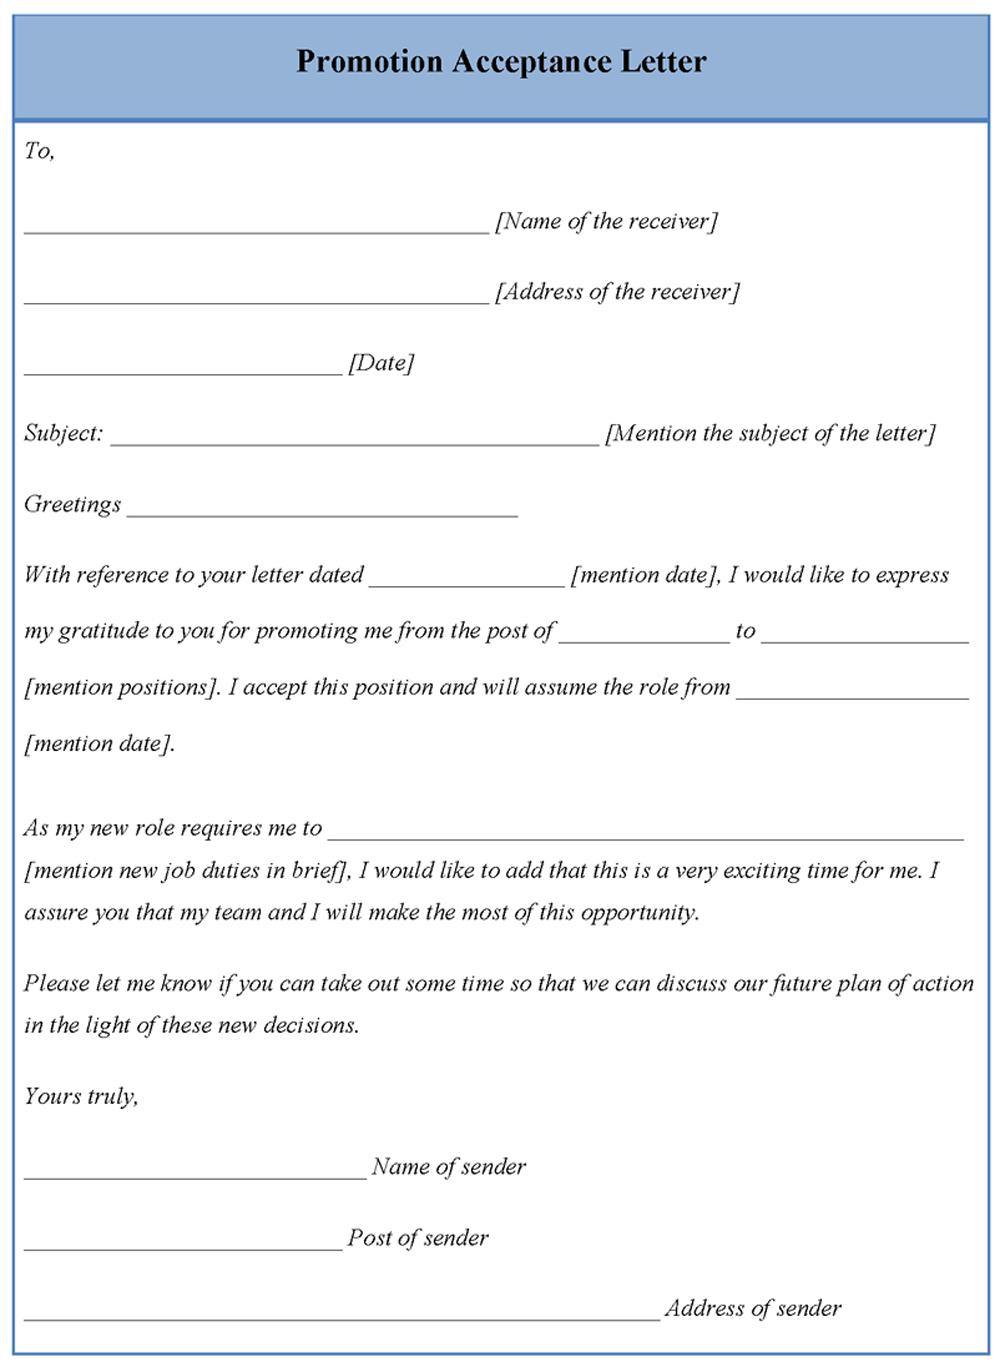 promotion acceptance letter template editable docs resume examples word document best sample for bankers registered nurse format